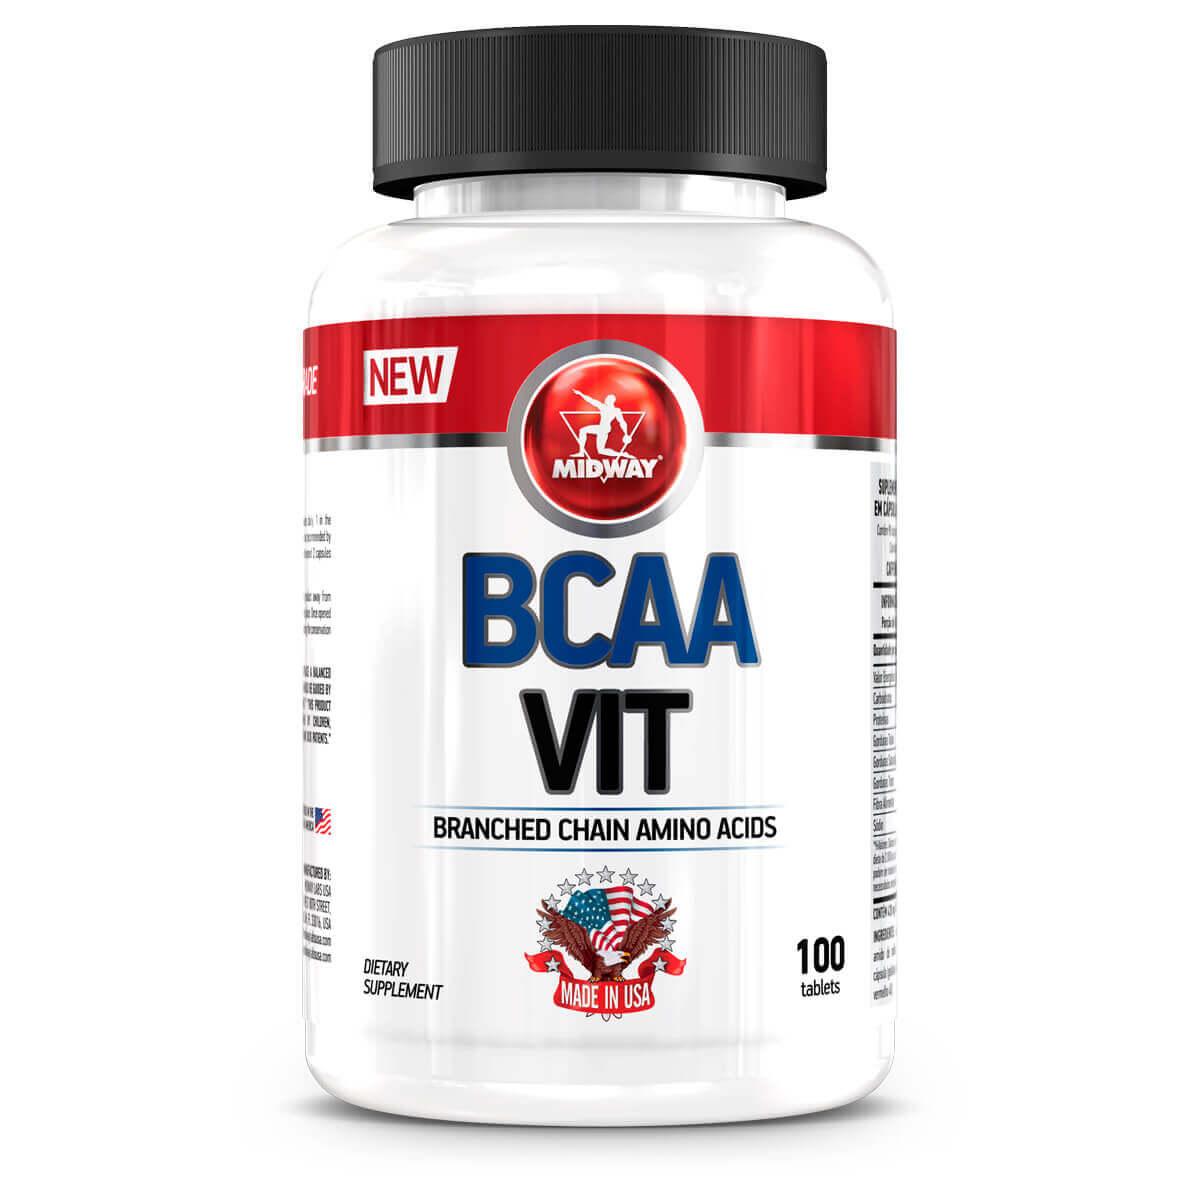 BCAA VIT Midway - 100 caps